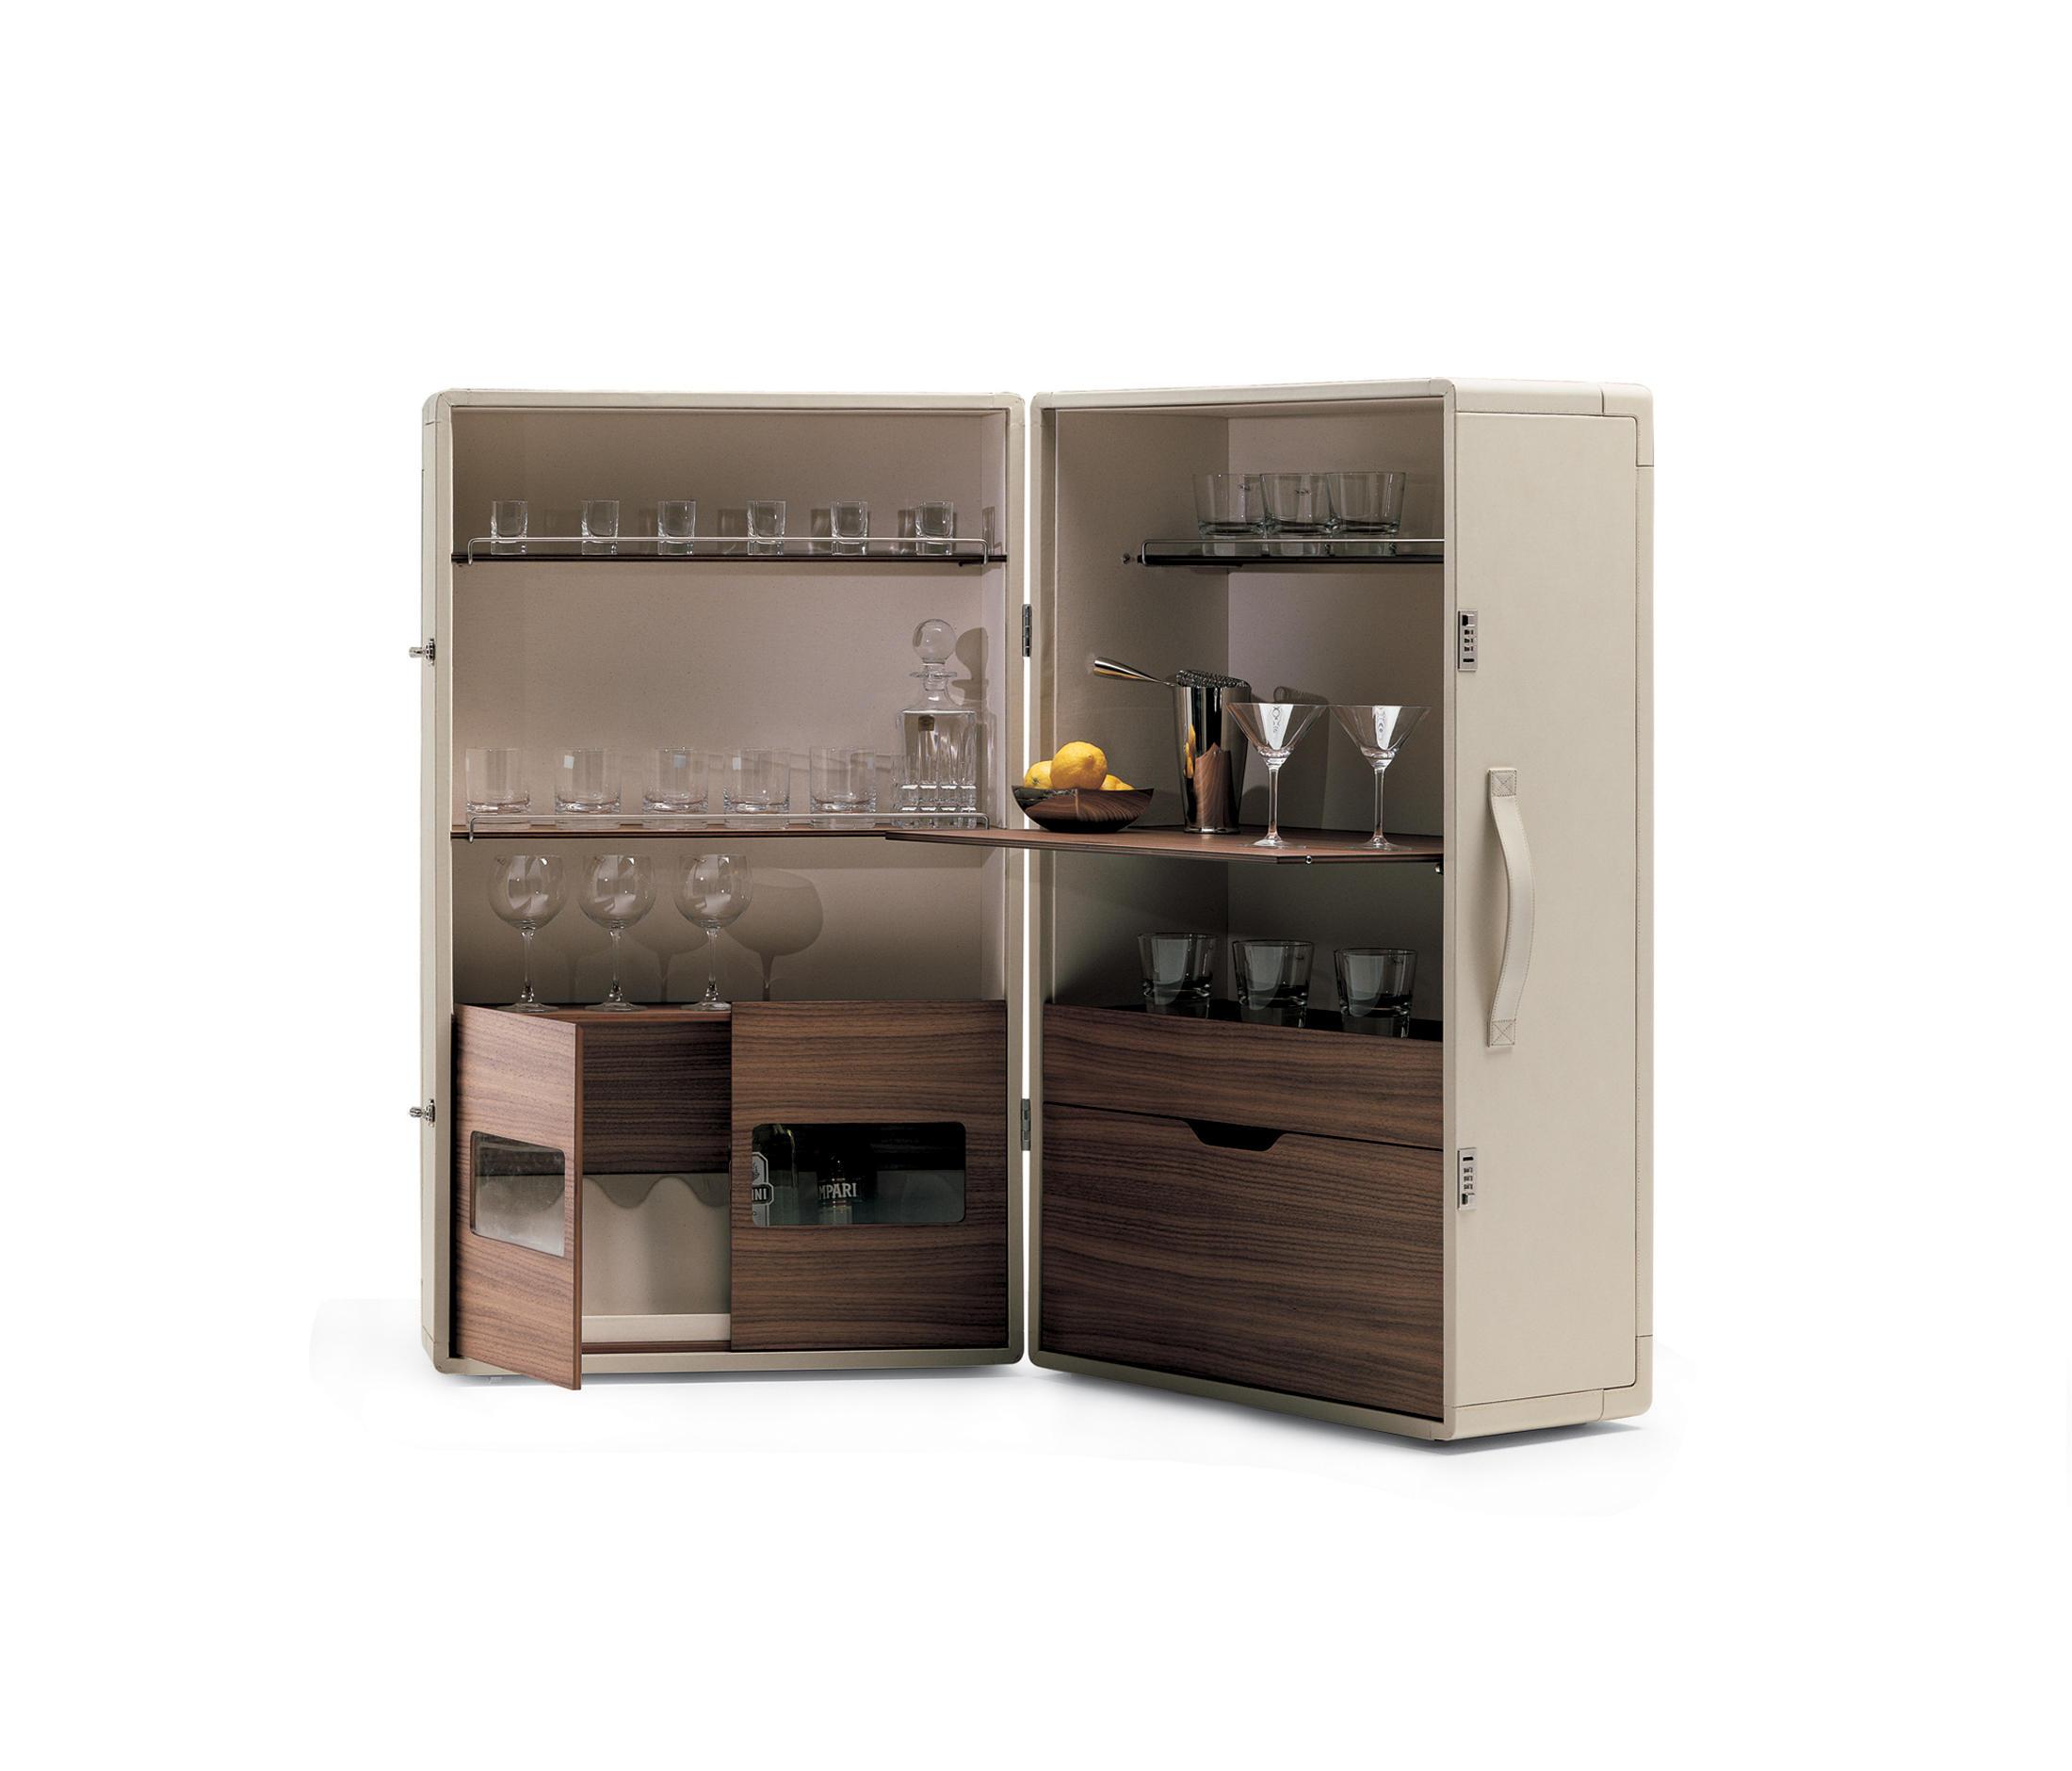 isidoro barschr nke hausbars von poltrona frau. Black Bedroom Furniture Sets. Home Design Ideas